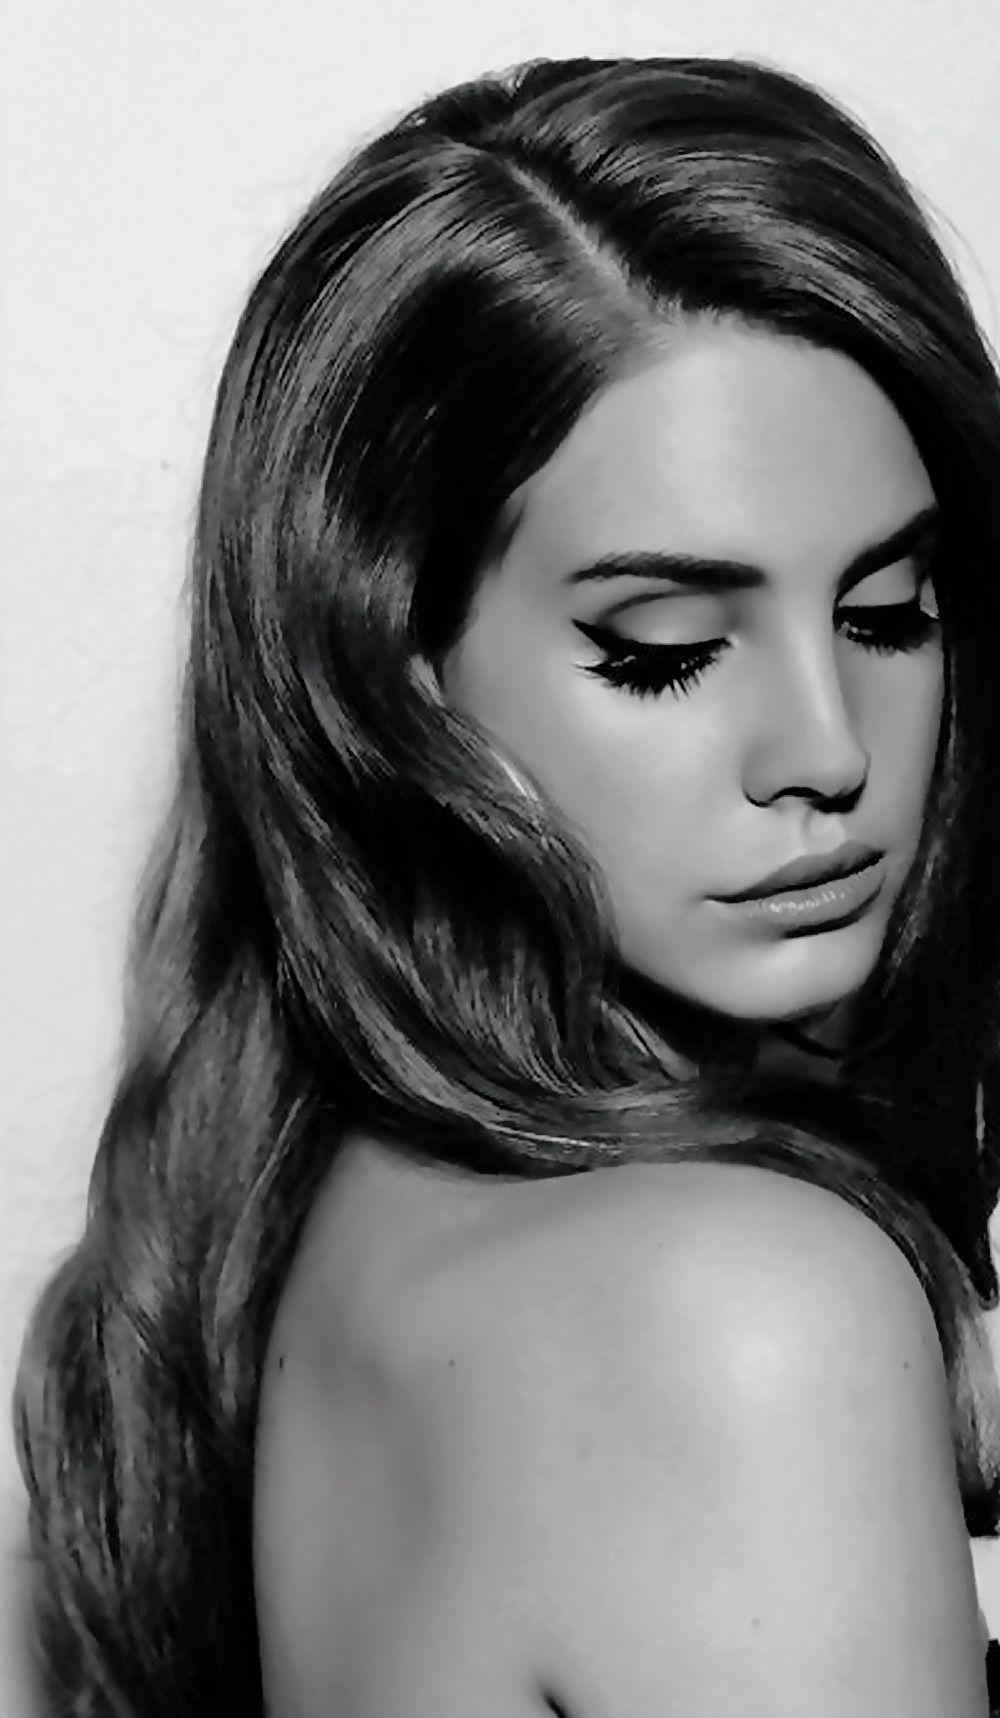 Lana Del Rey Wallpaper ldr in 2019 Lana del rey Lana del 1000x1718